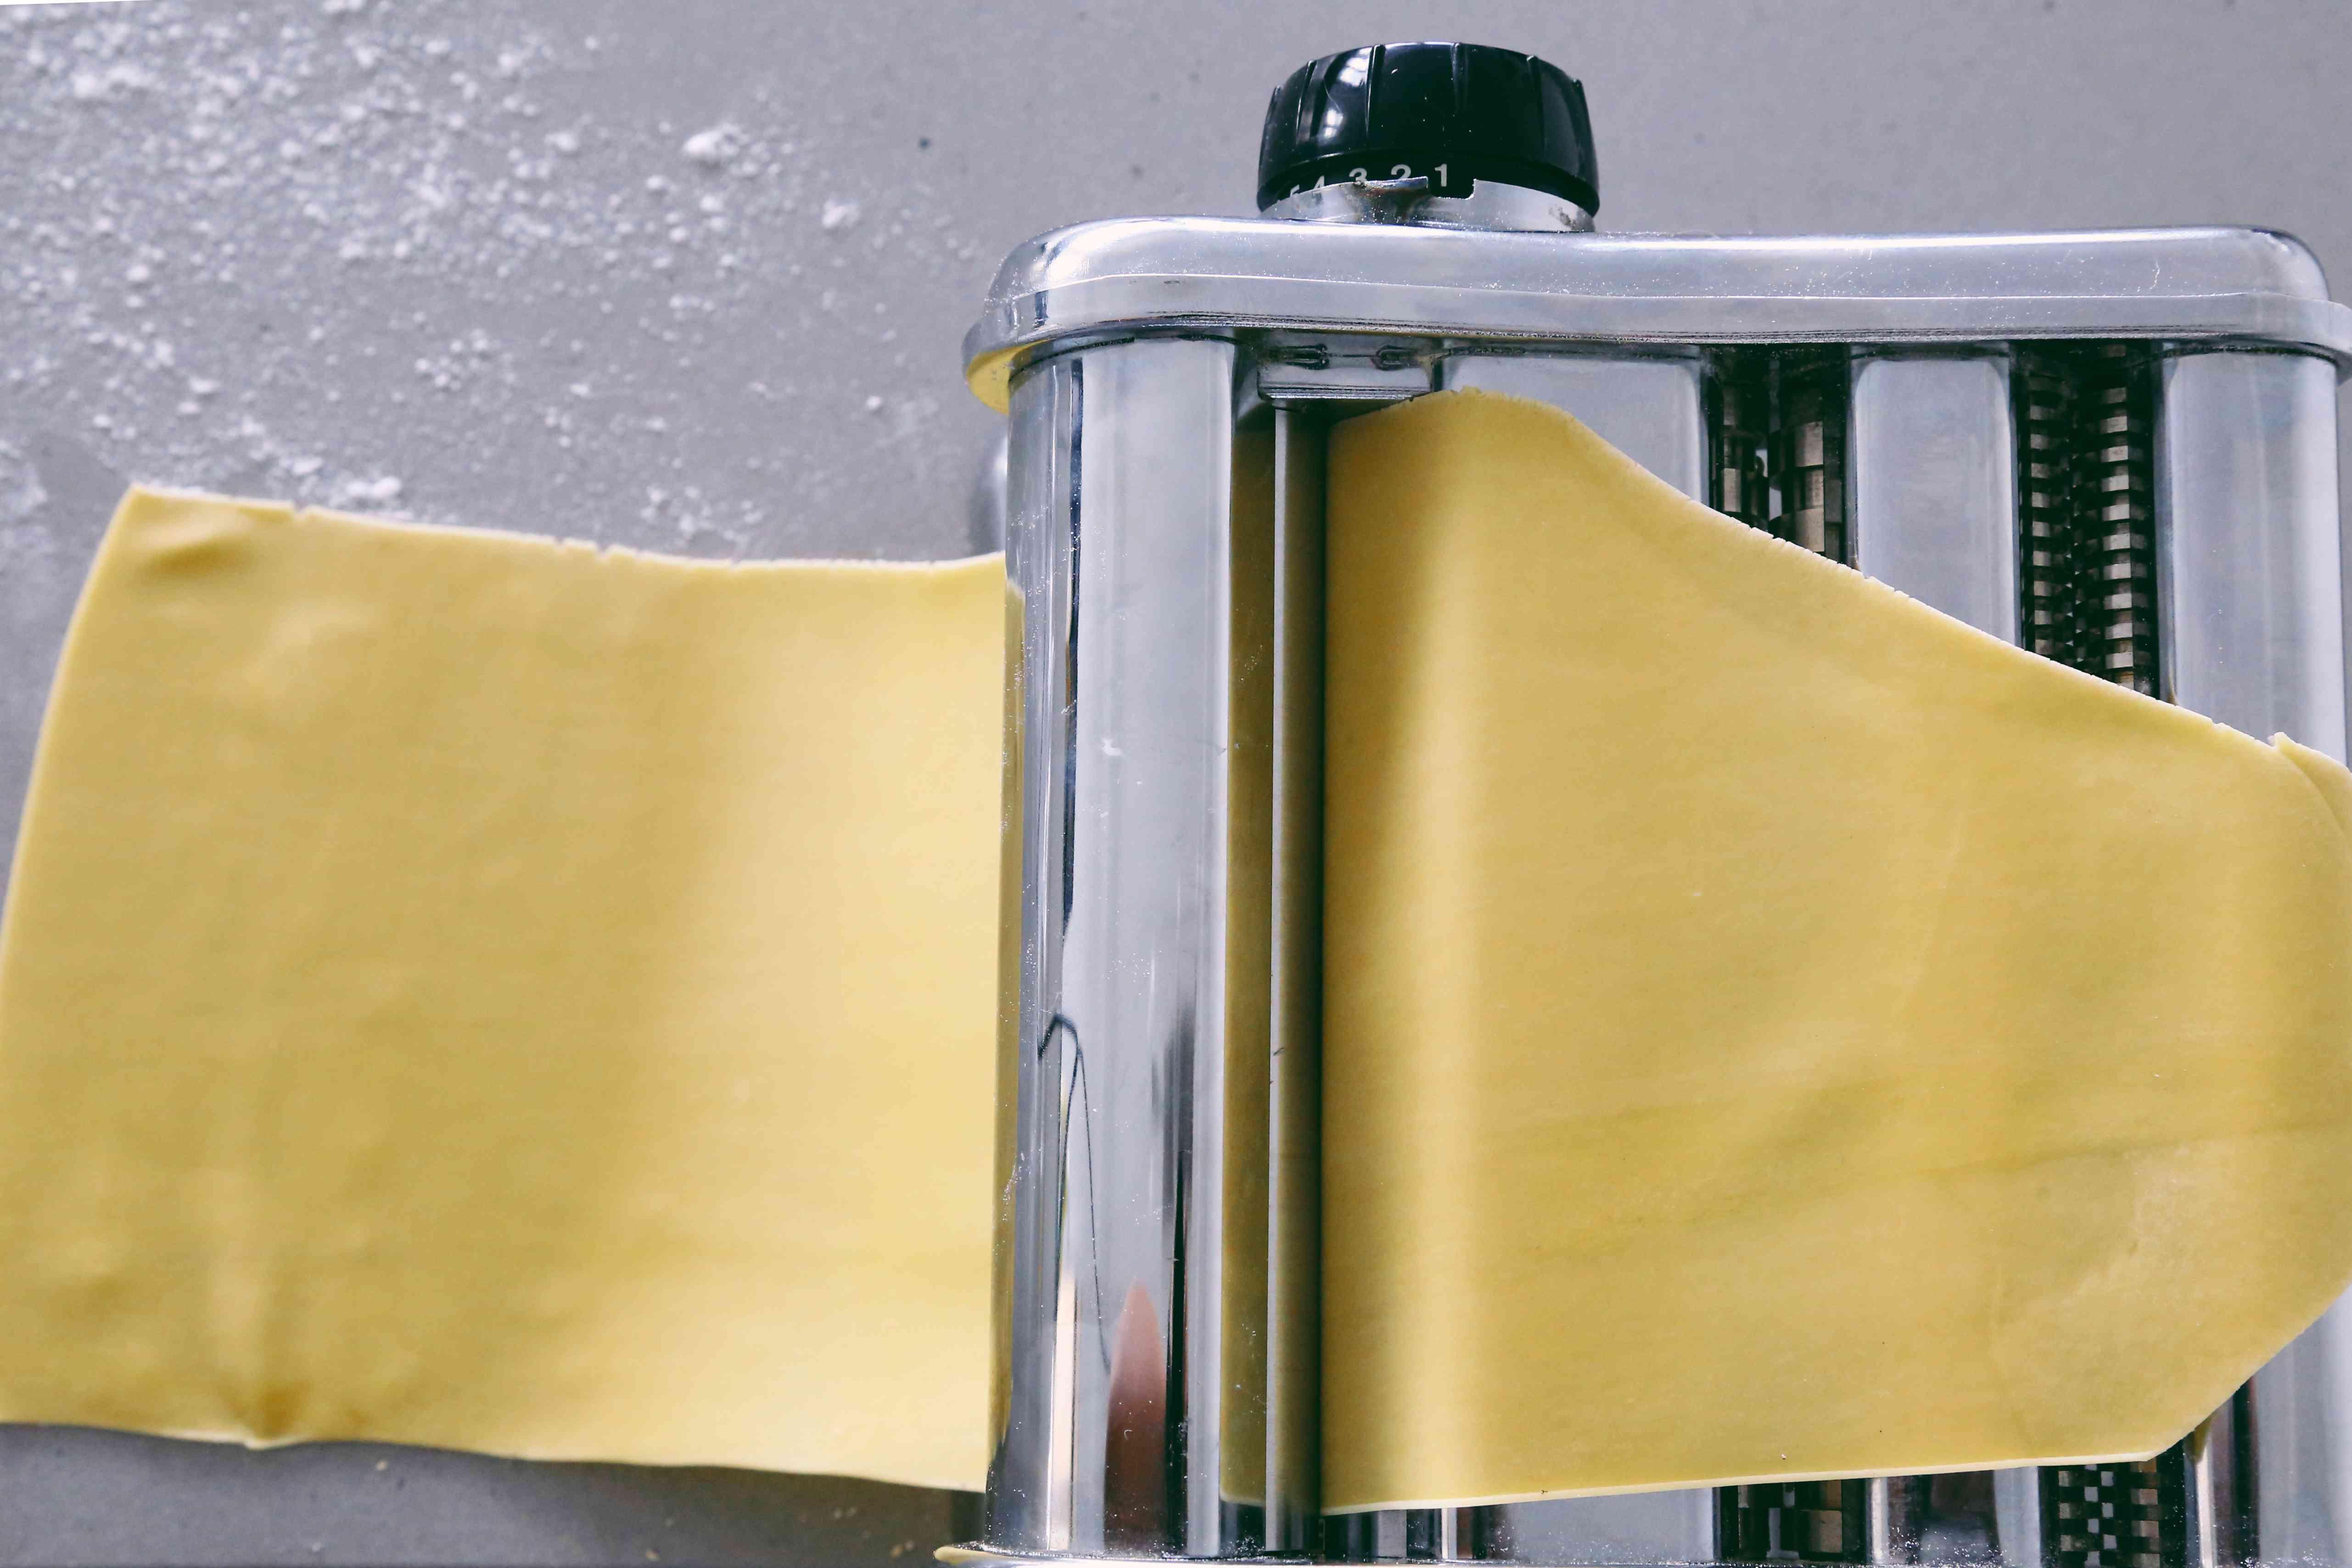 pasta dough sheet in a pasta roller